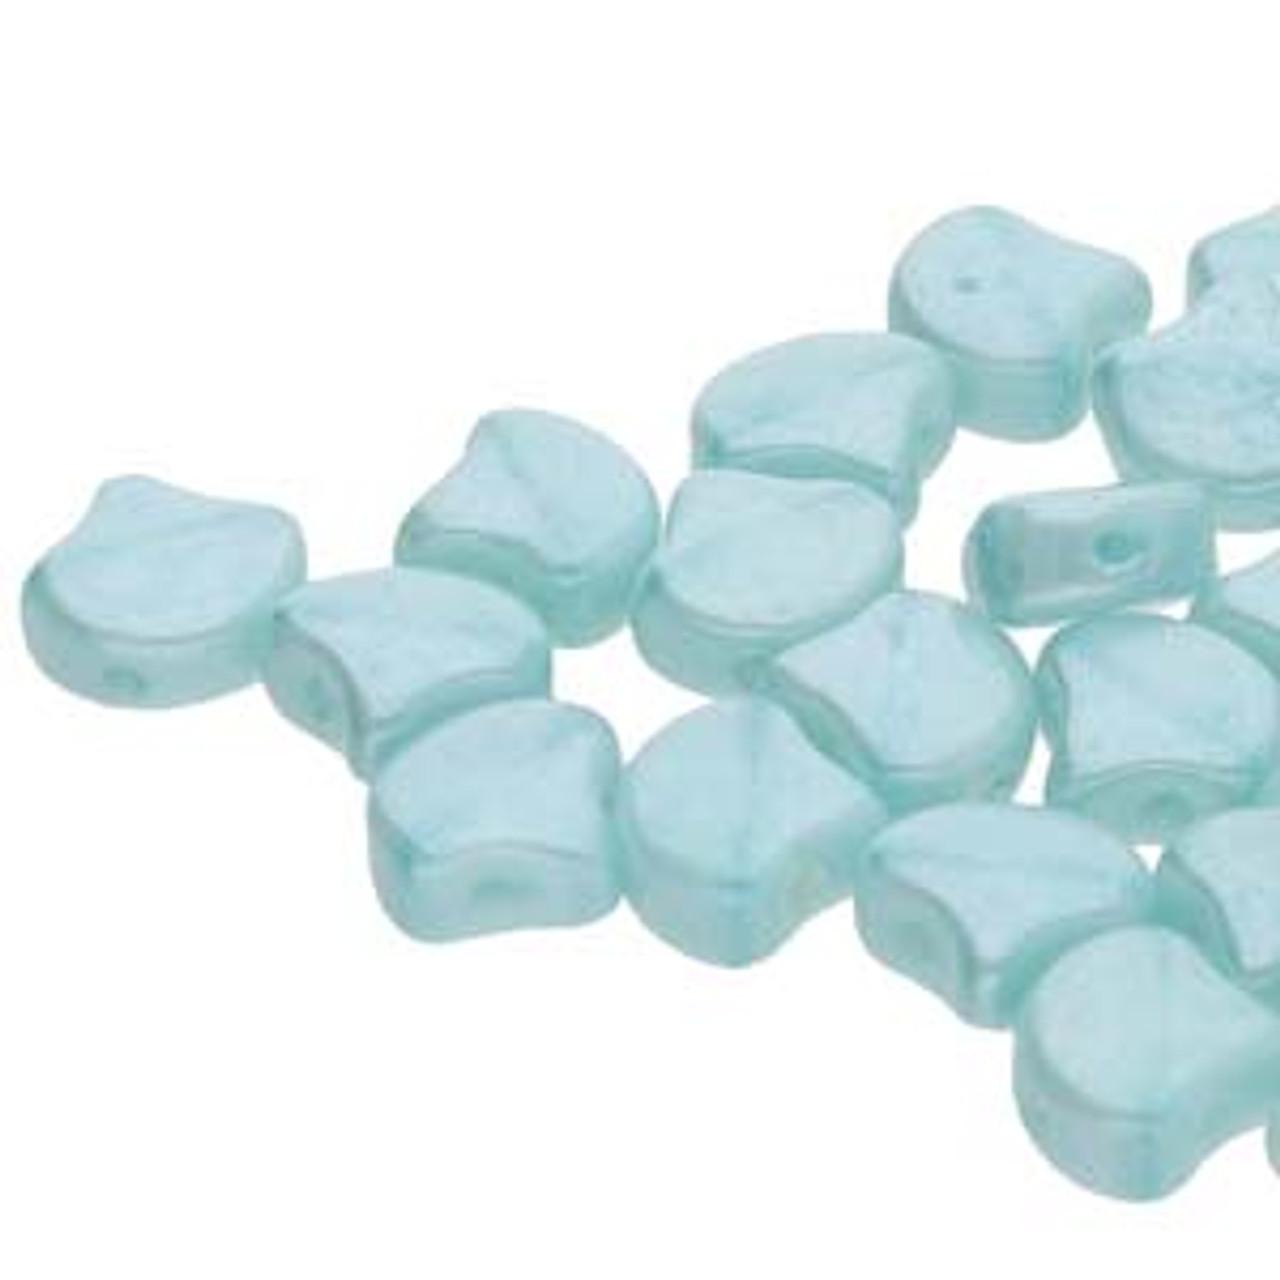 7.5x7.5mm Silk Blue OPal White Luster Ginko Beads (8 Grams)